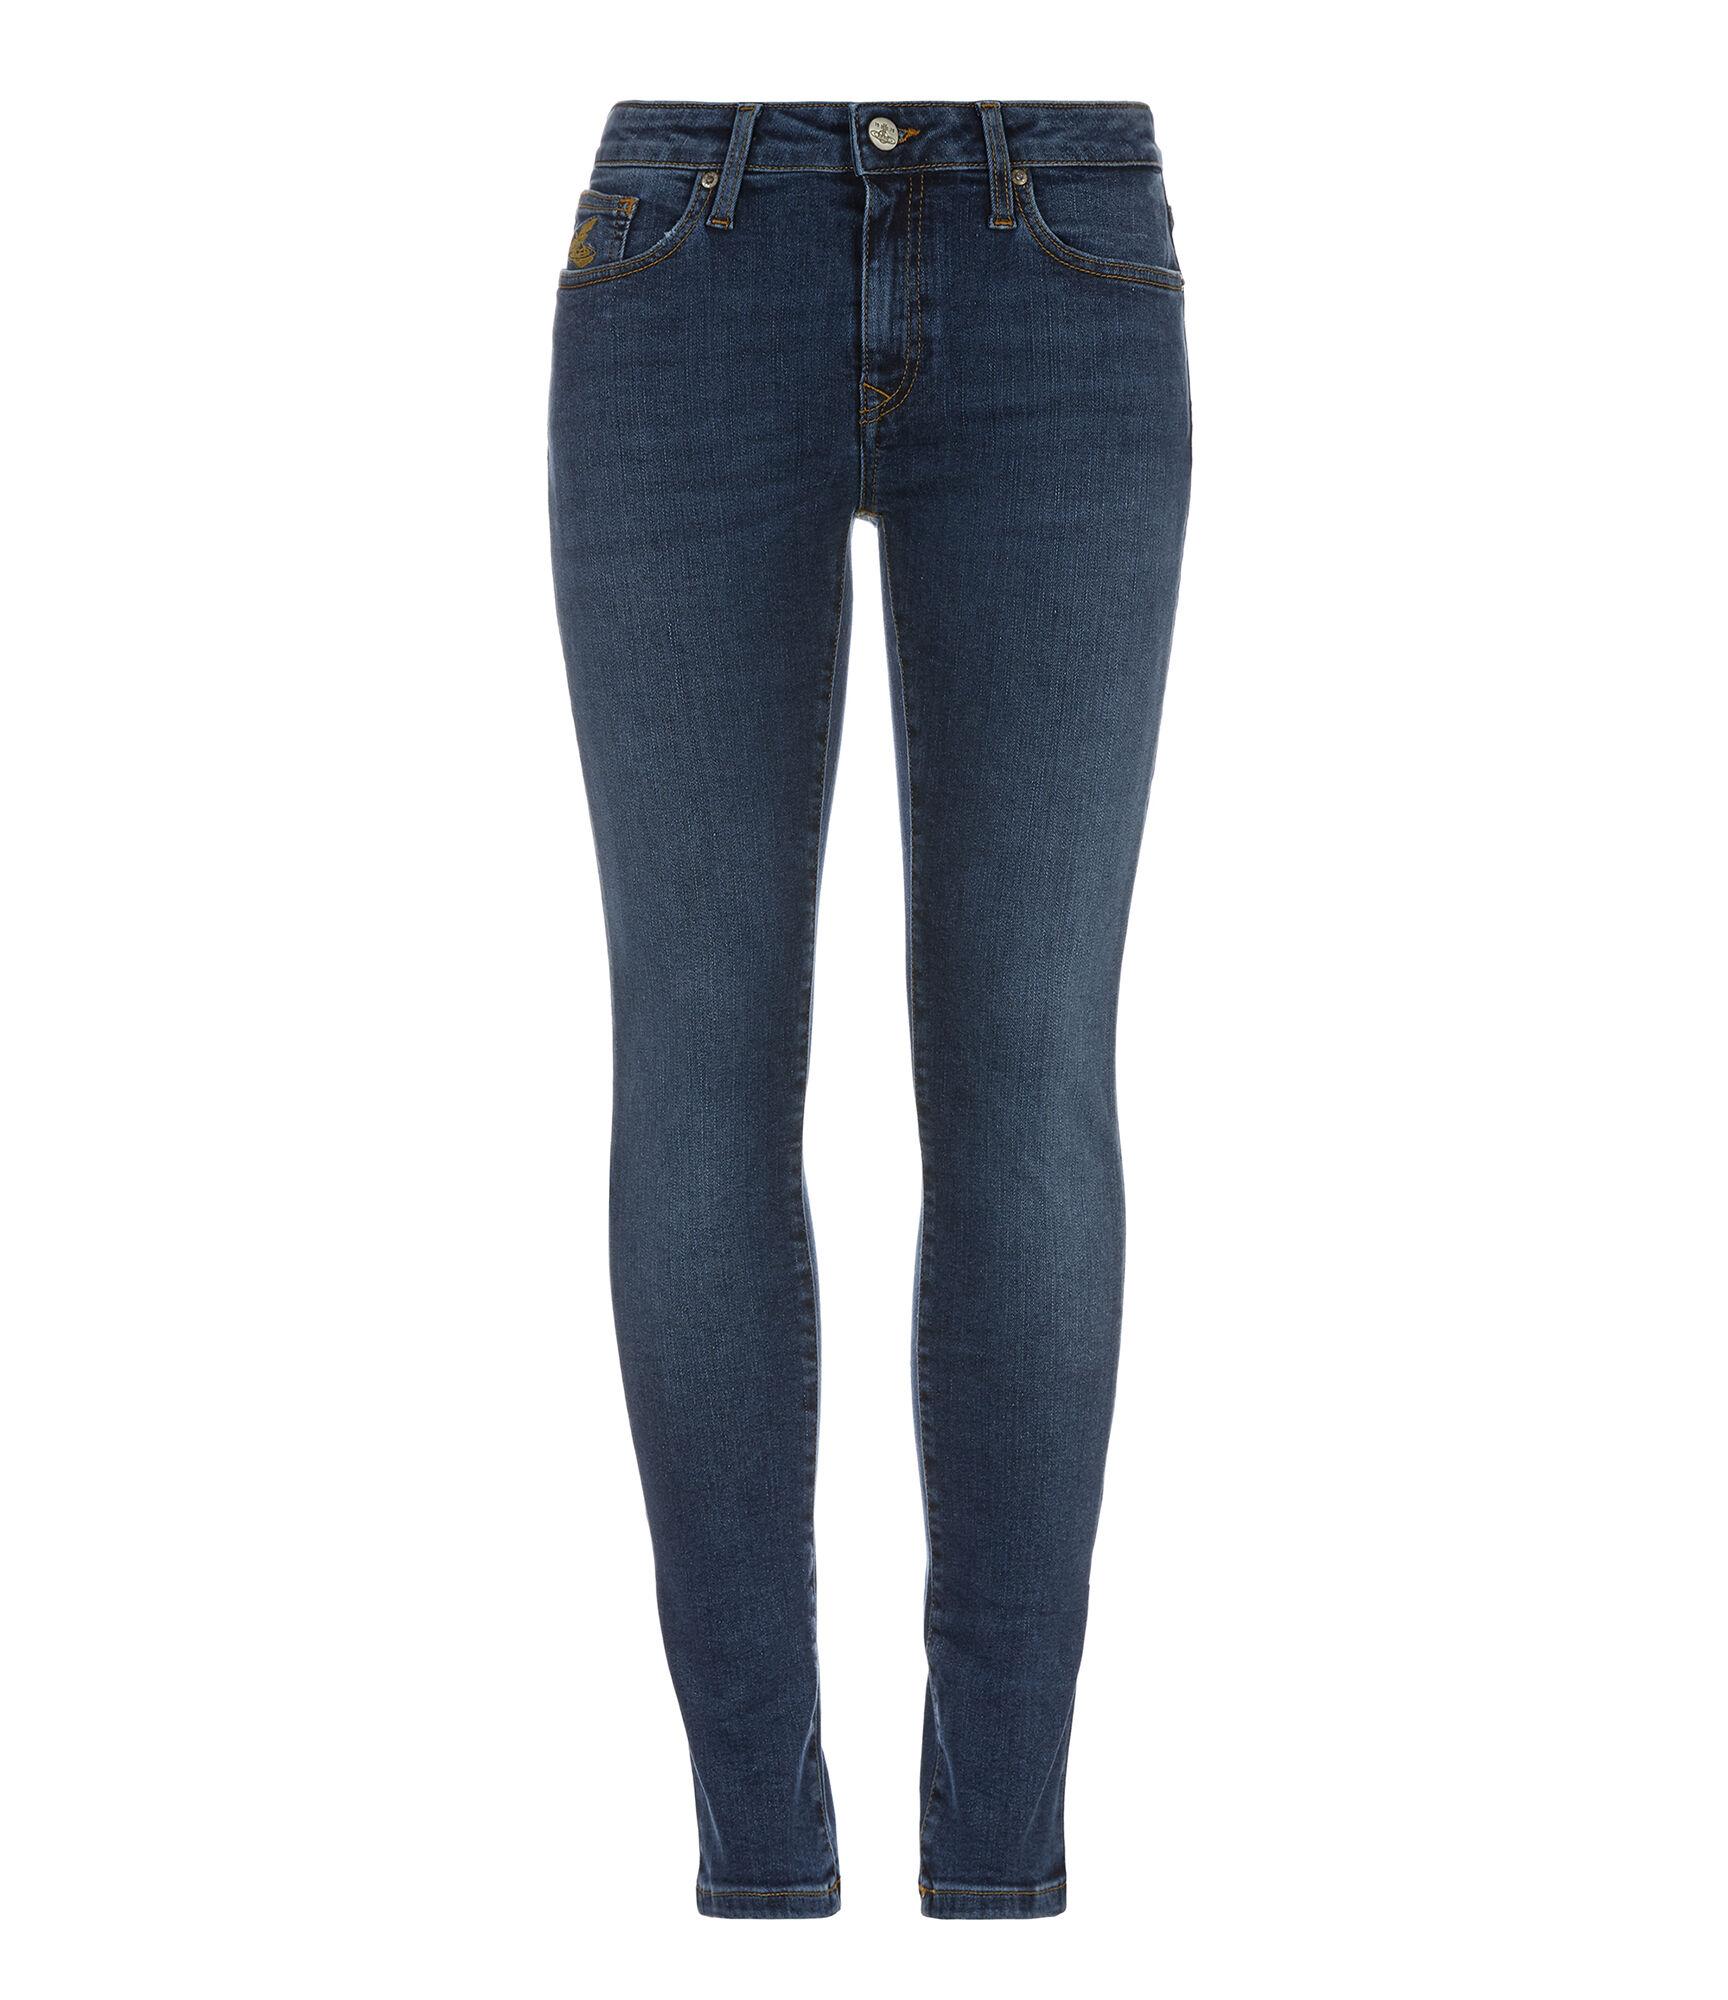 Super Skinny Jeans Blue Denim